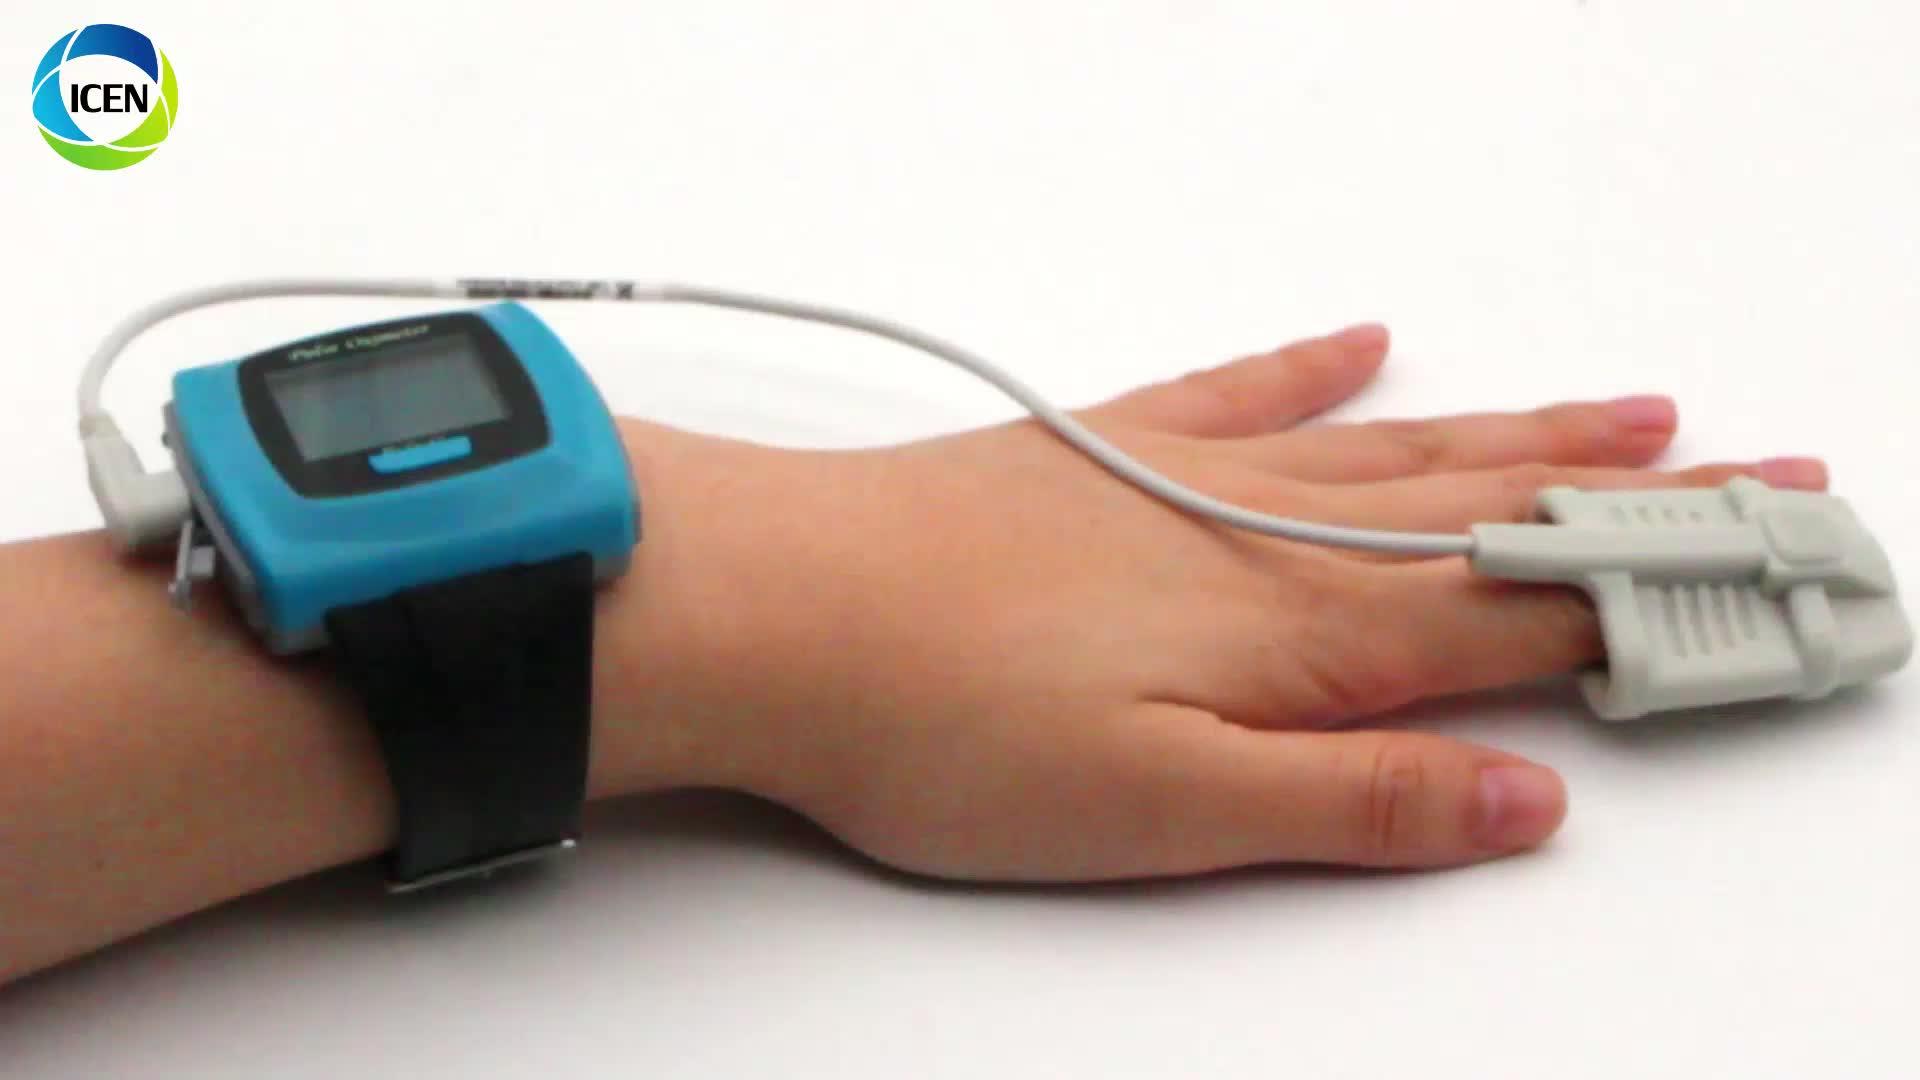 IN-C50F FDA Medical Portable Bluetooth Wifi OLED Display Smart Bracelet Watch Finger Pulse Oximeter